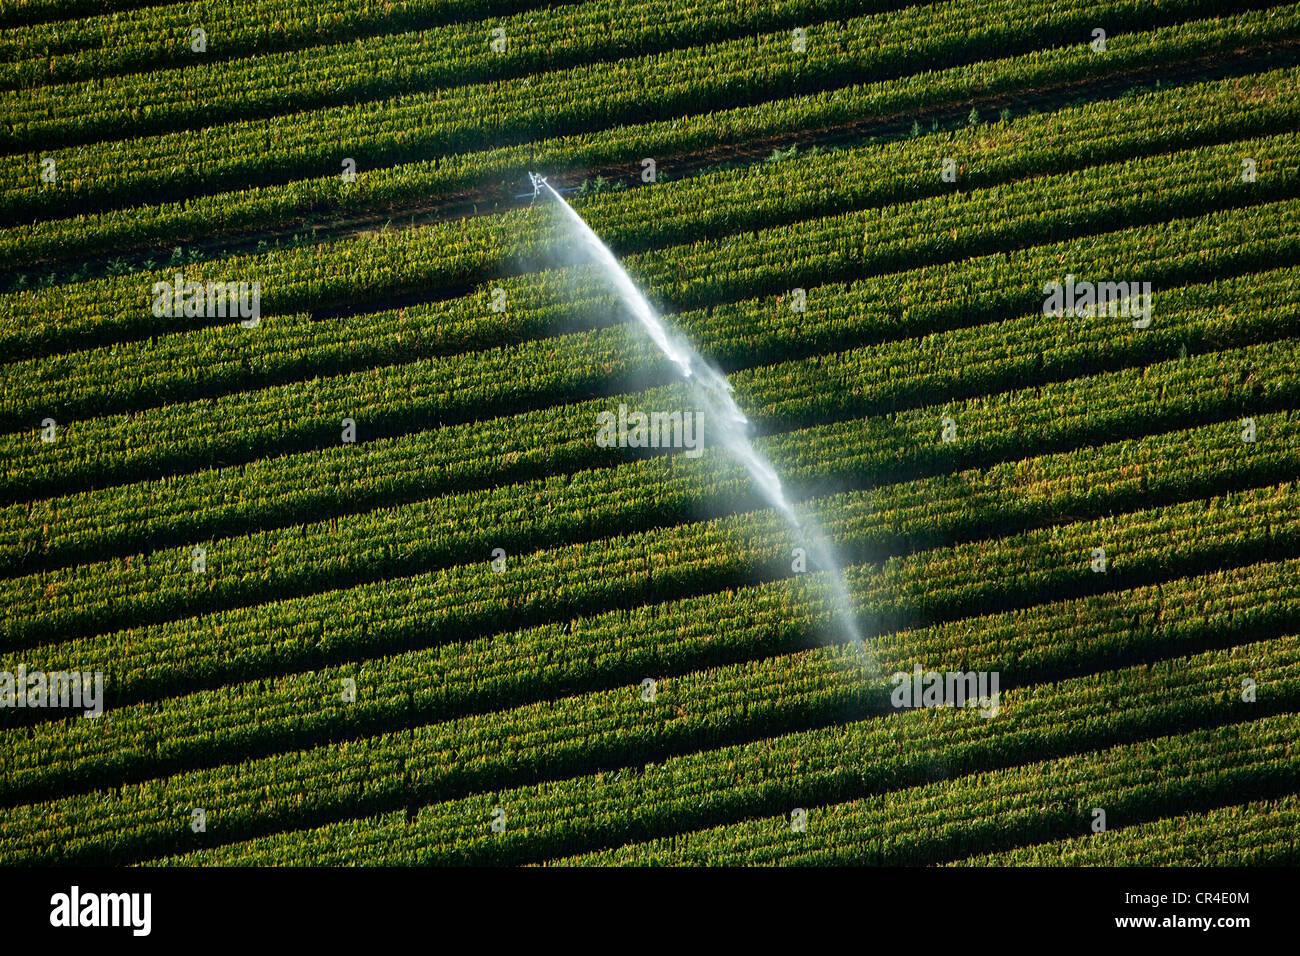 Frankreich, Var, Rian, Beregnung in einem Maisfeld (Luftbild) Stockbild